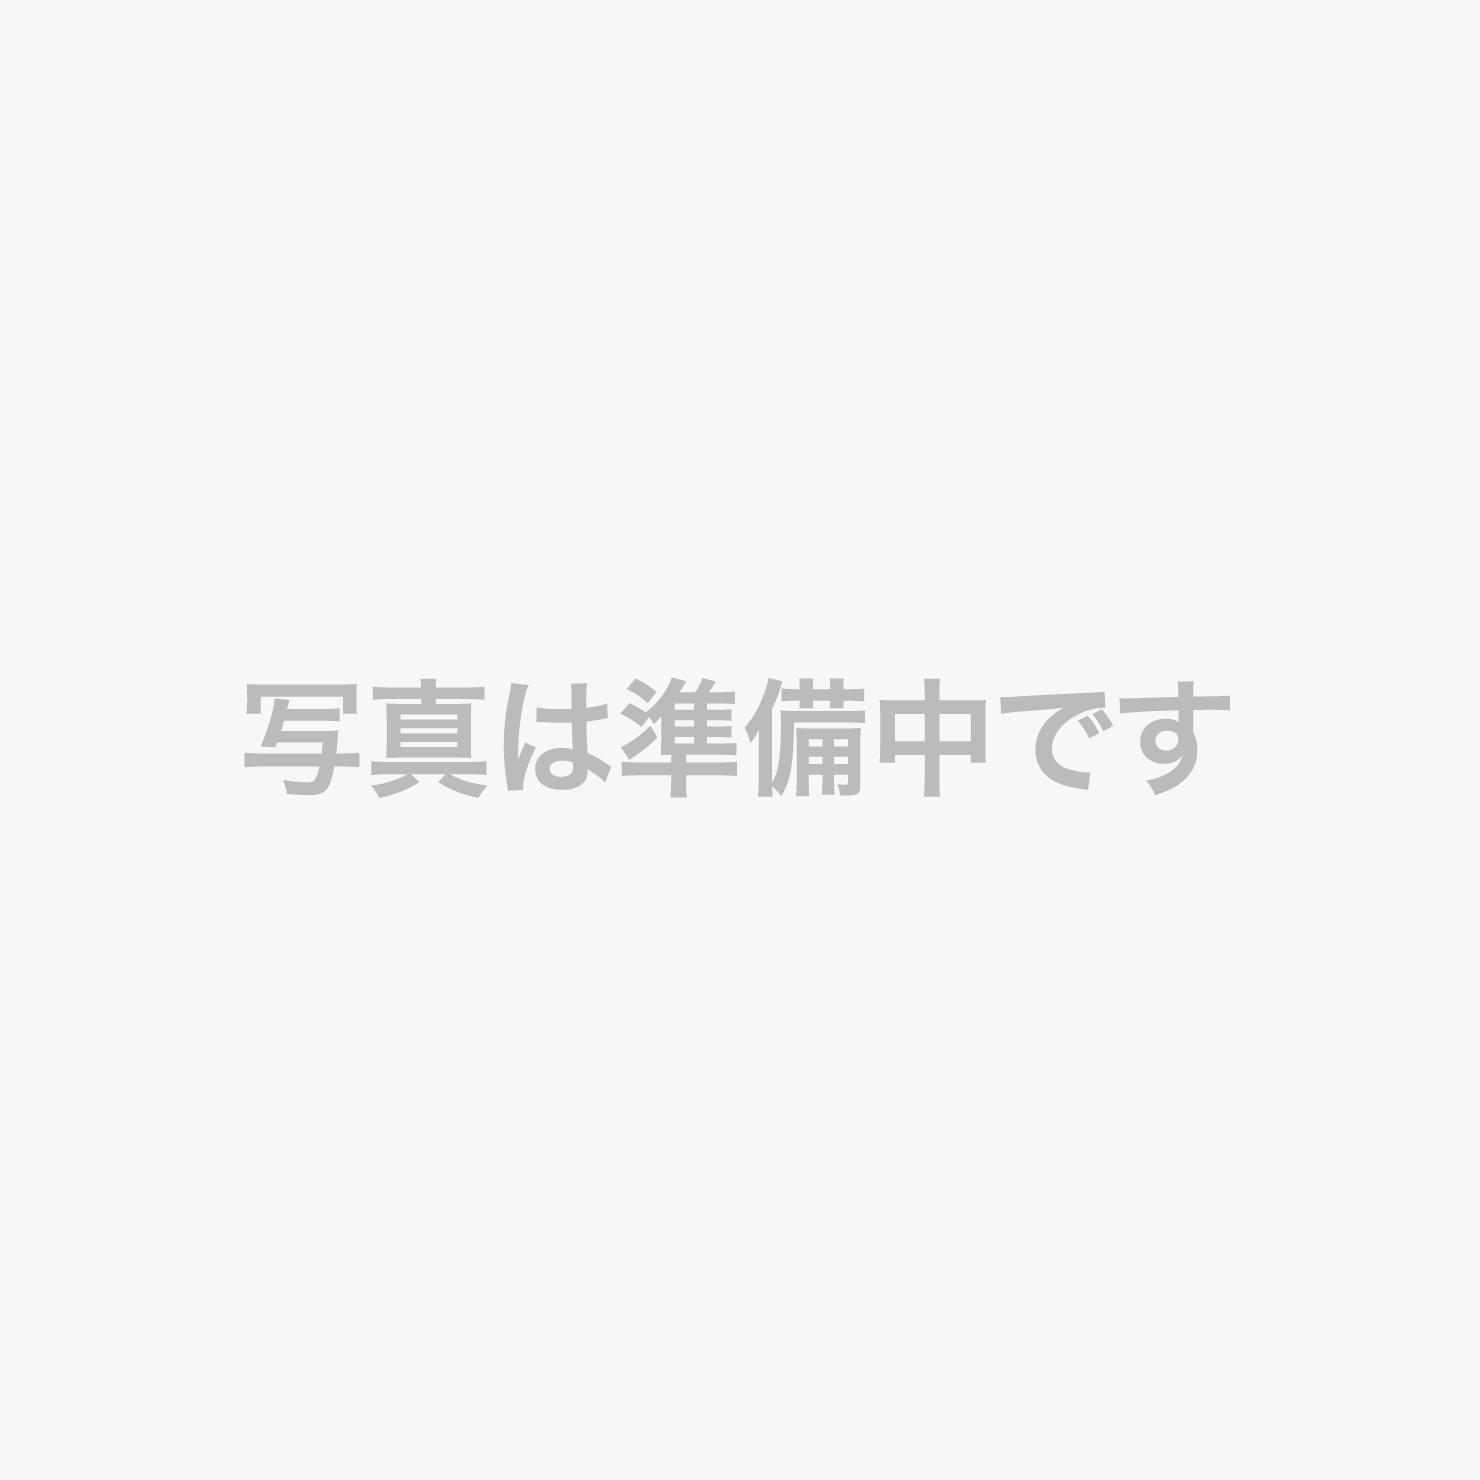 2F日本料理【吉備膳】世代を繋ぐ「縁」の庵。心に響くおもてなしとお料理で、あなたの大切な一日をお手伝いいたします。